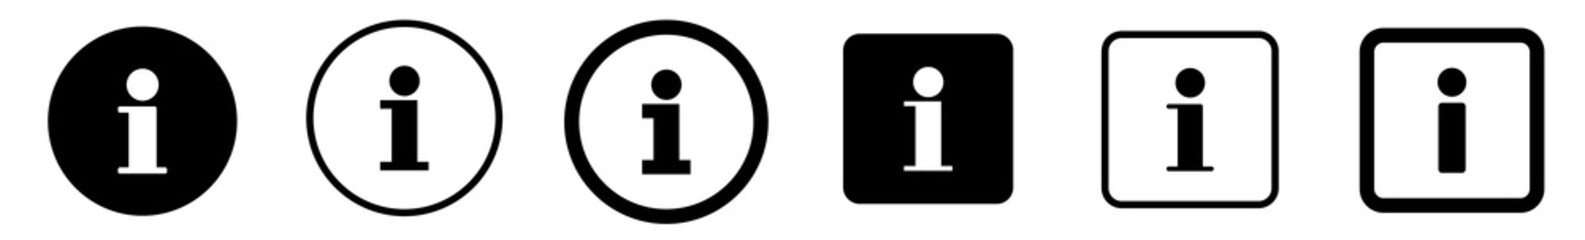 Obraz Info Point Icon Black | Information Illustration | i Point Symbol | Help Logo | Hint Sign | Isolated | Variations - fototapety do salonu